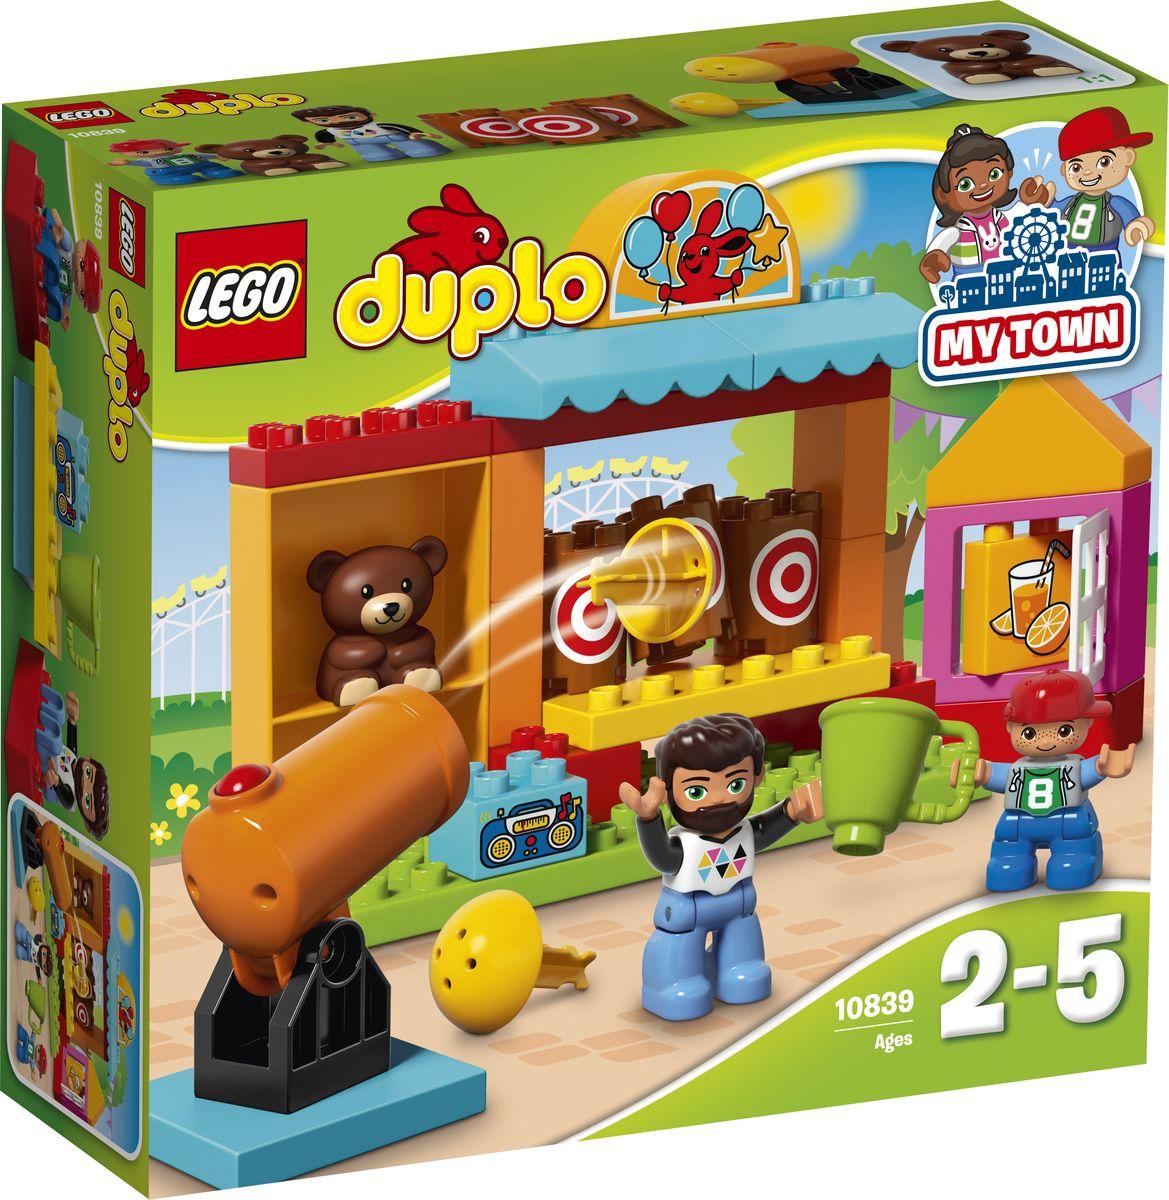 LEGO DUPLO My Town Конструктор Тир 10839 lego lego duplo 10586 фургон с мороженым